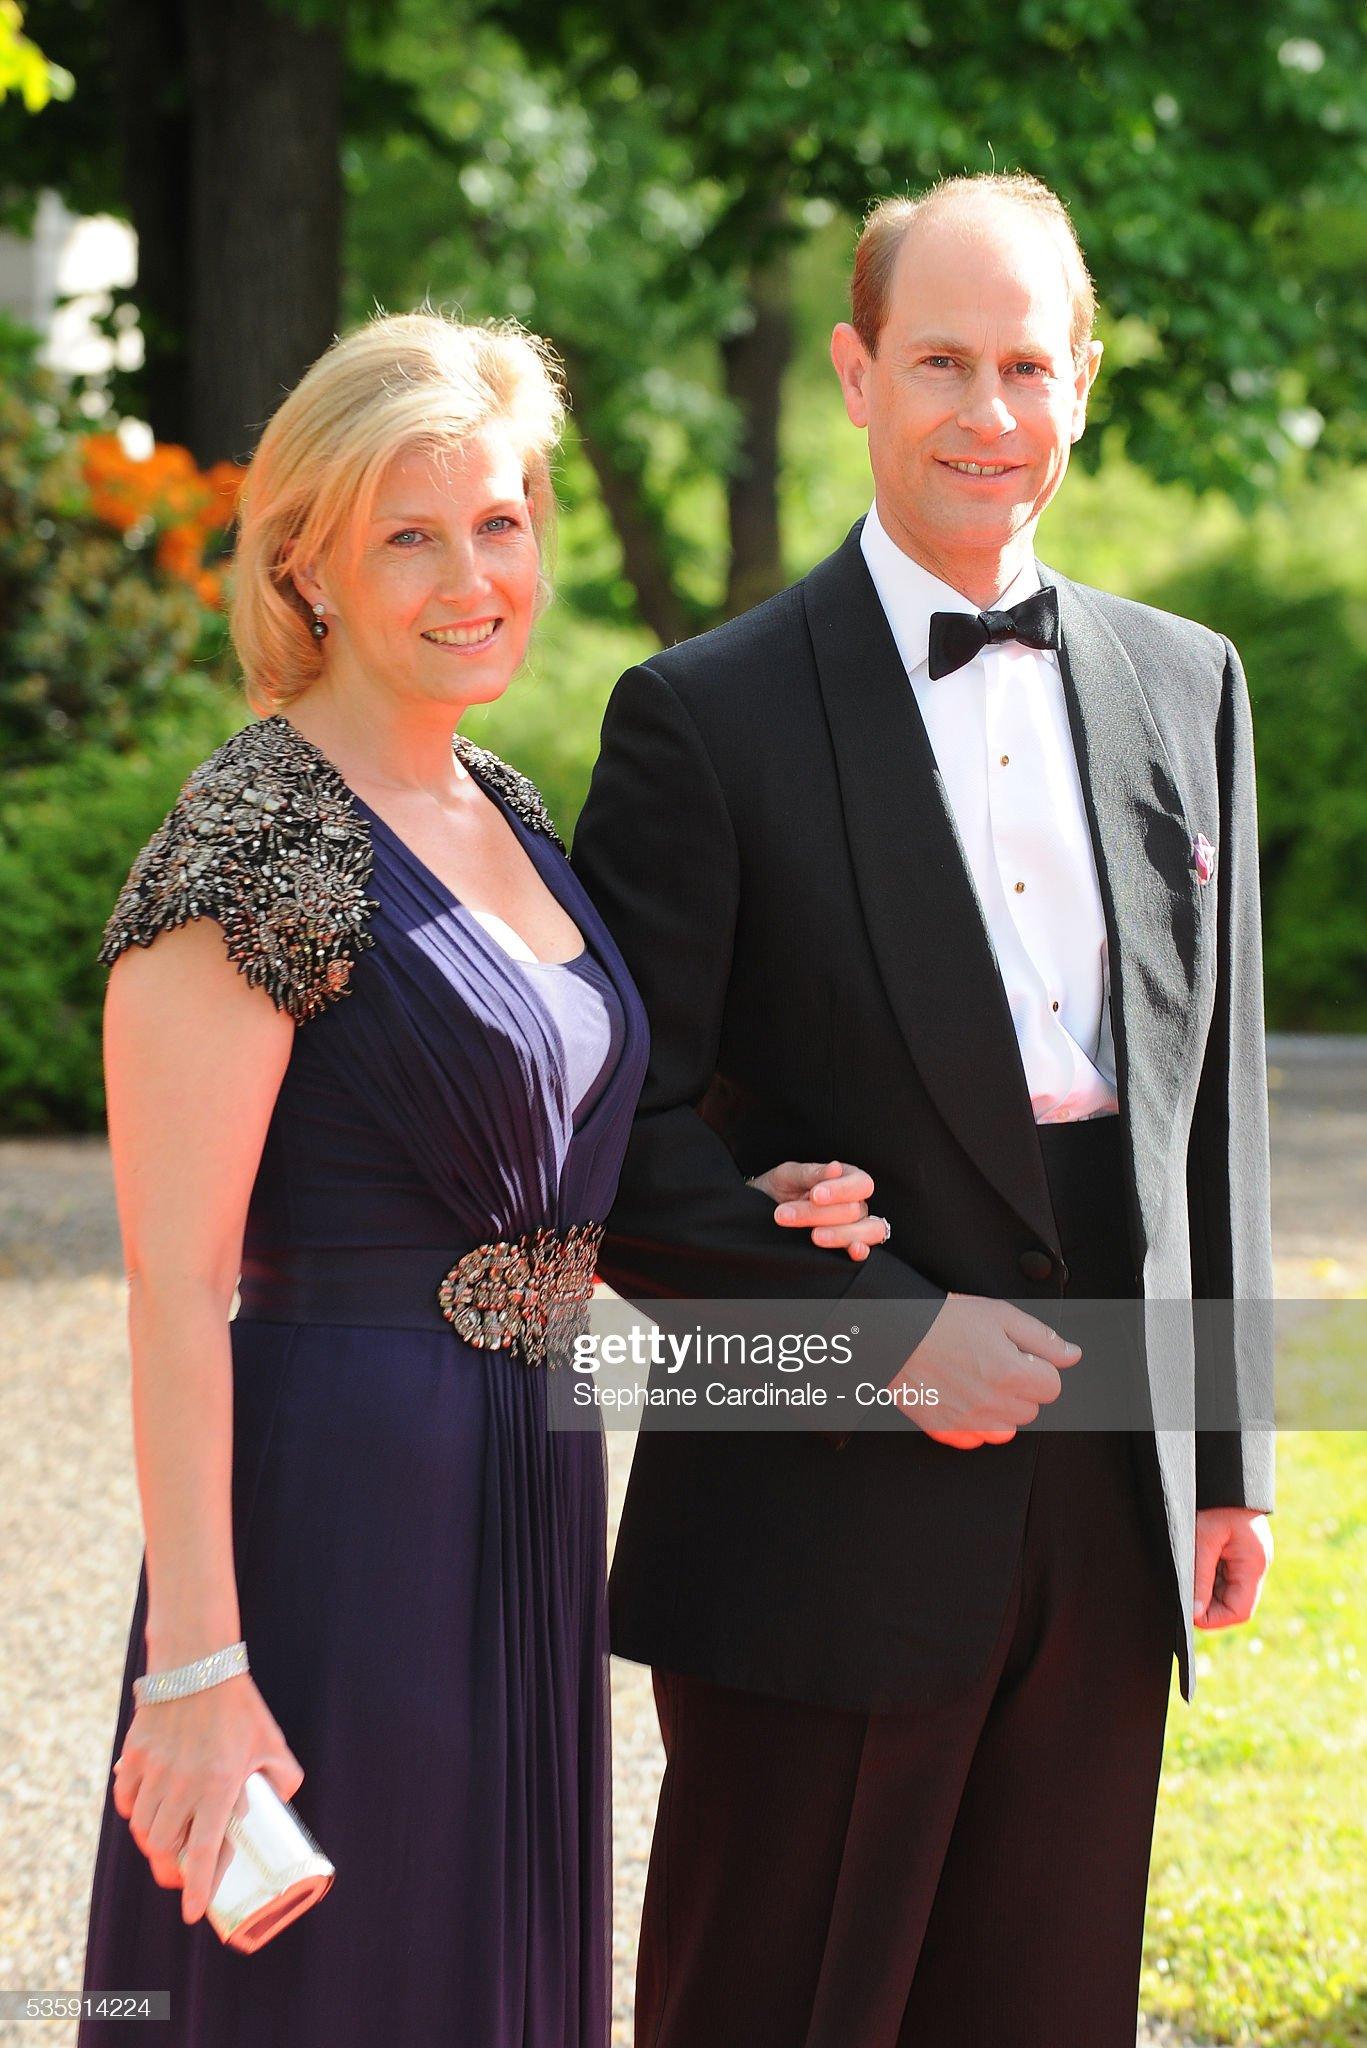 Sweden - Royalty - Crown Princess Victoria & Daniel Westling - Pre-Wedding Festivities : News Photo